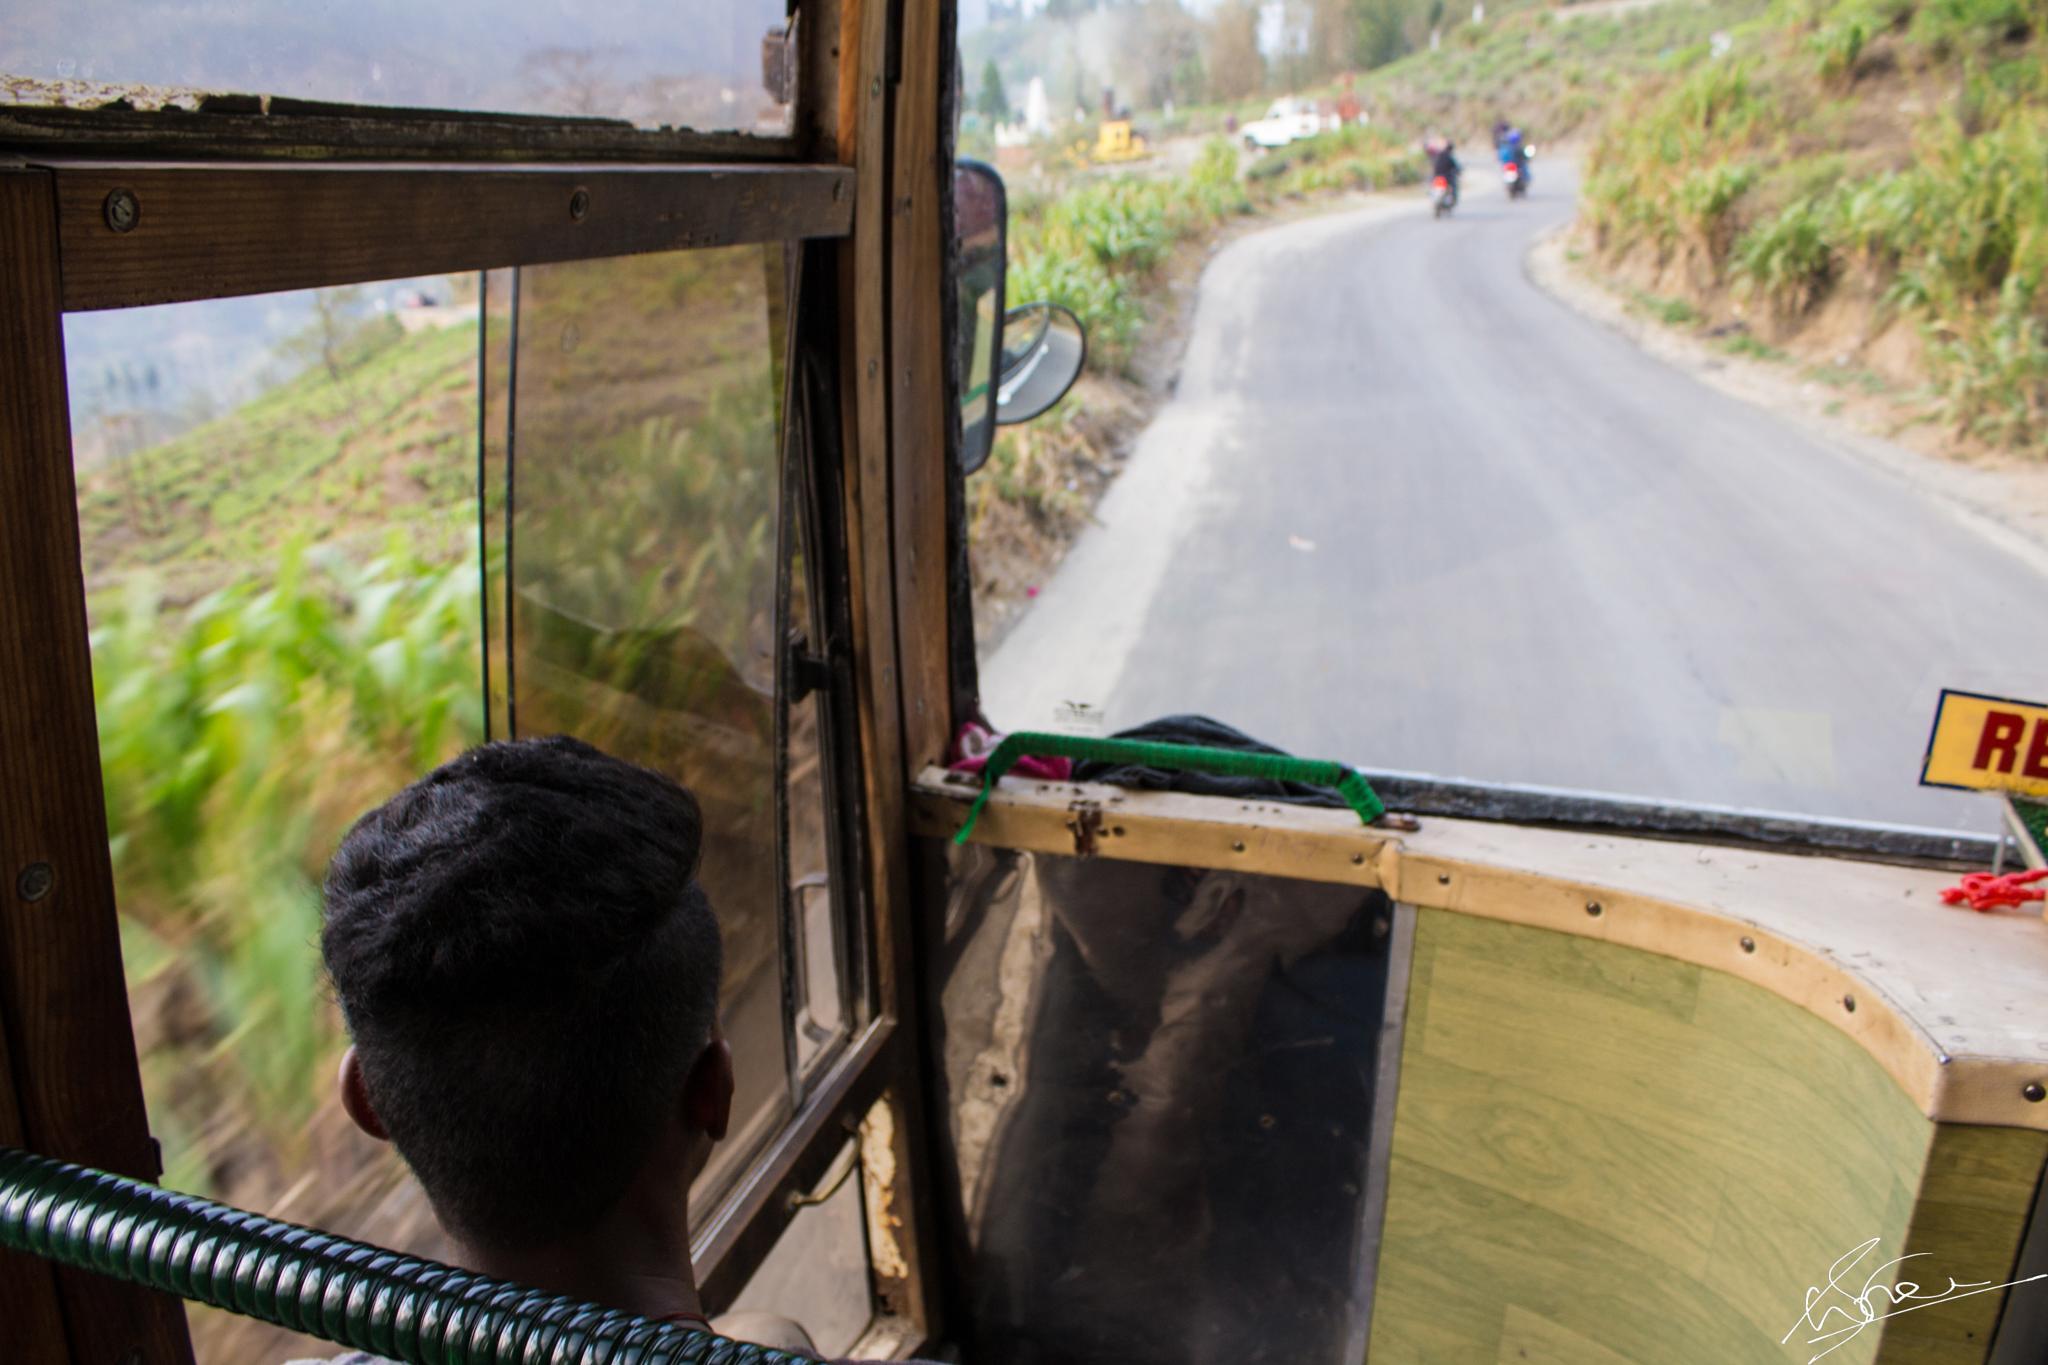 Road to heaven(Darjeeling) by Naman Sharma